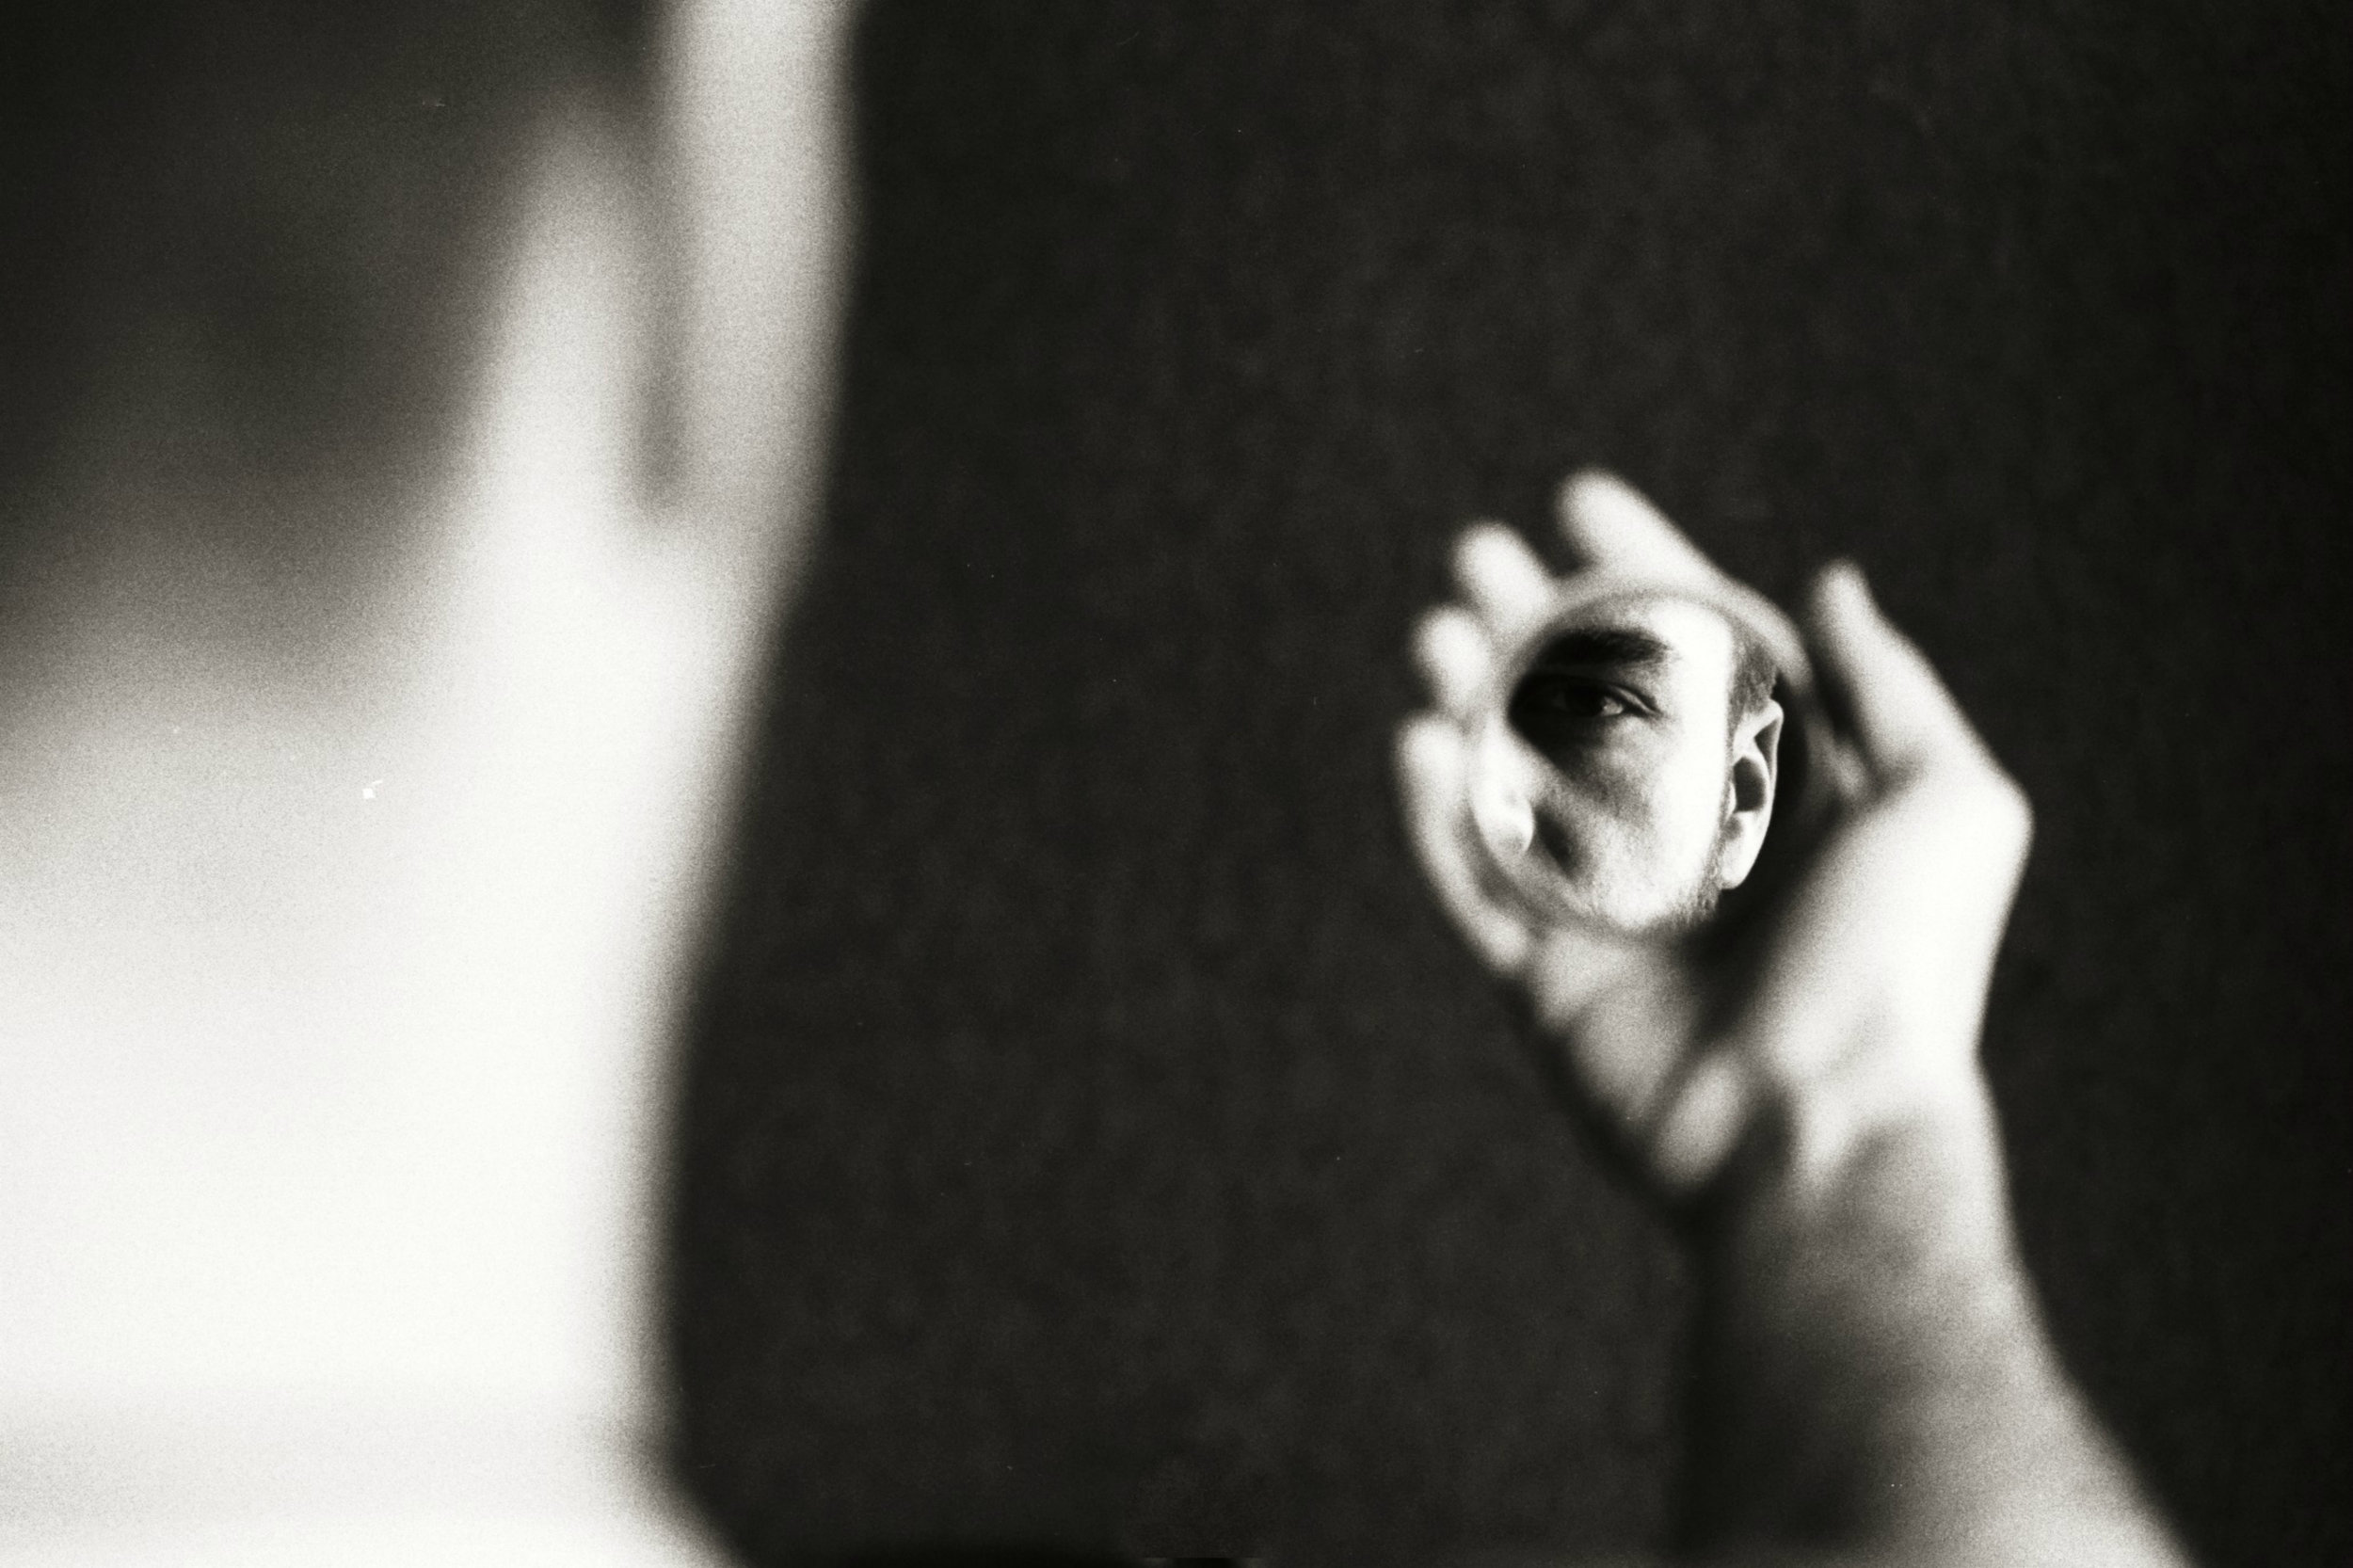 Zurab Chachanidze | Face in little mirror | Nikon F90 | Kodak T-Max 100